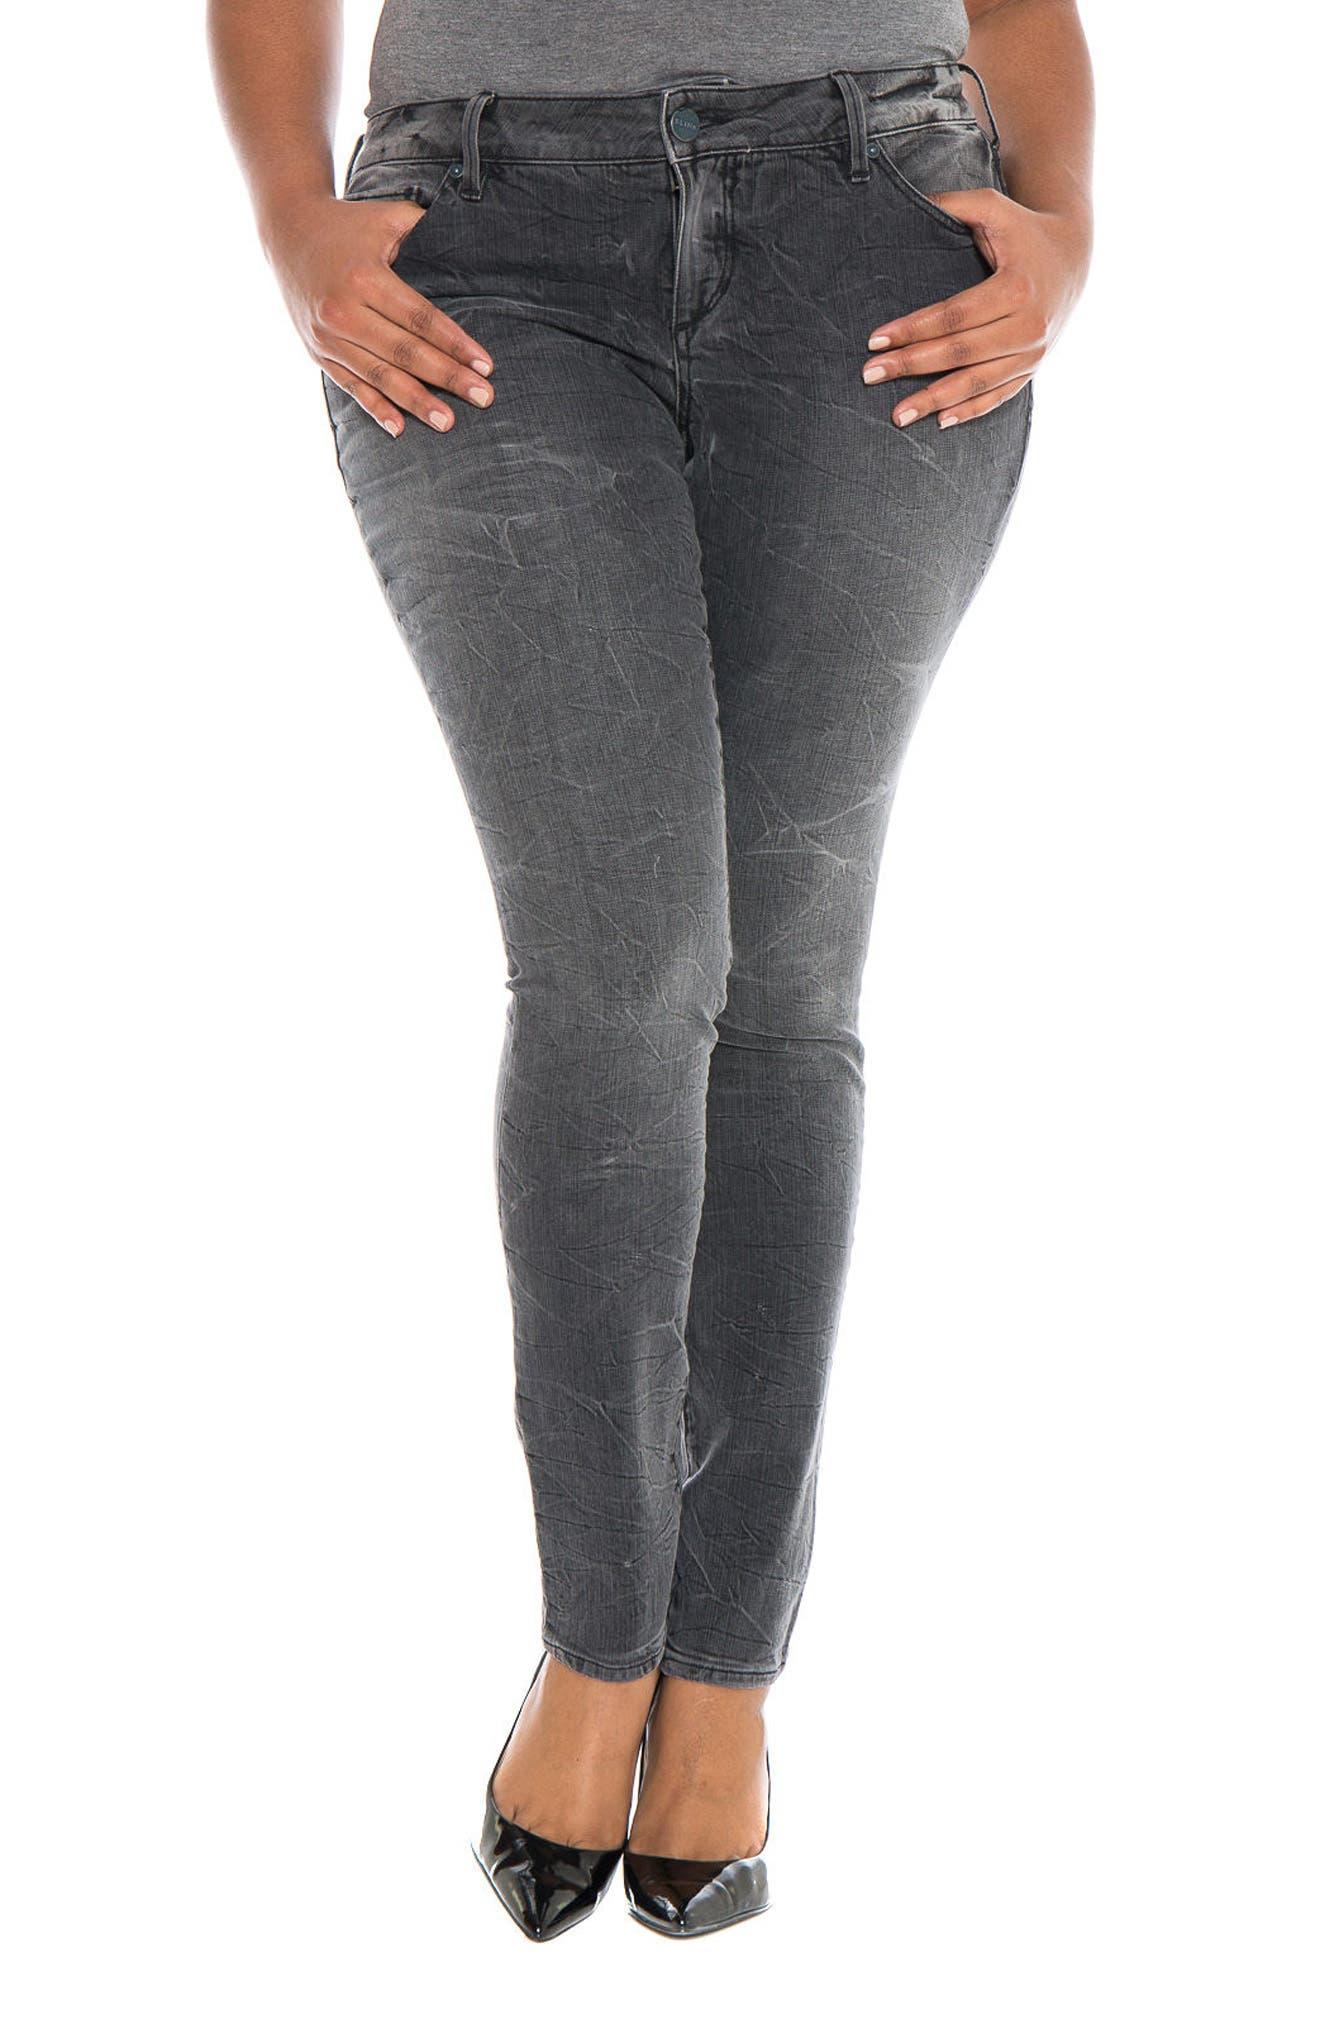 SLINK JEANS Stretch Skinny Jeans